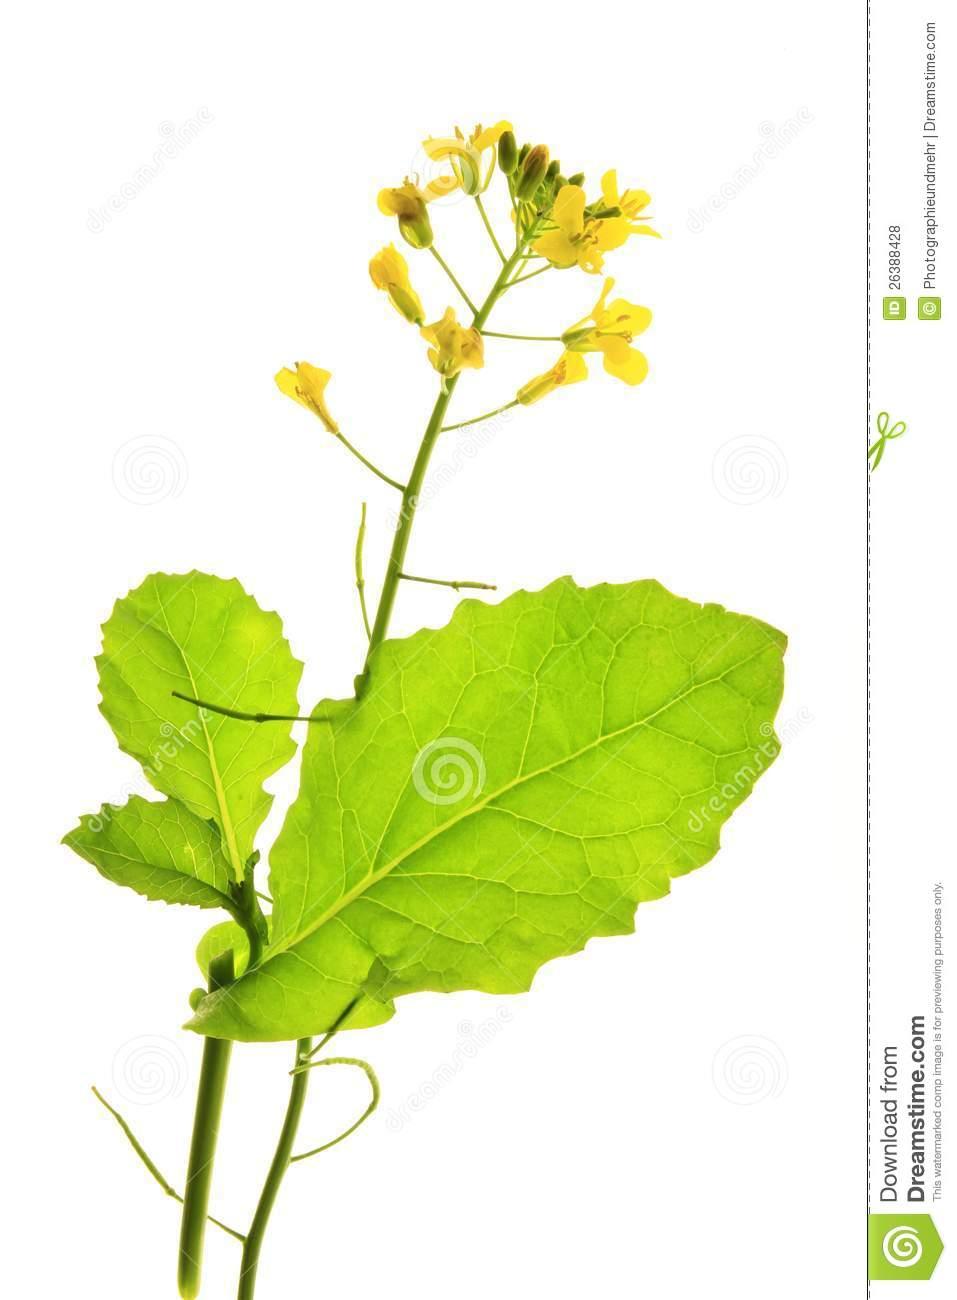 Canola Plant (Brassica Napus) Royalty Free Stock Photos.